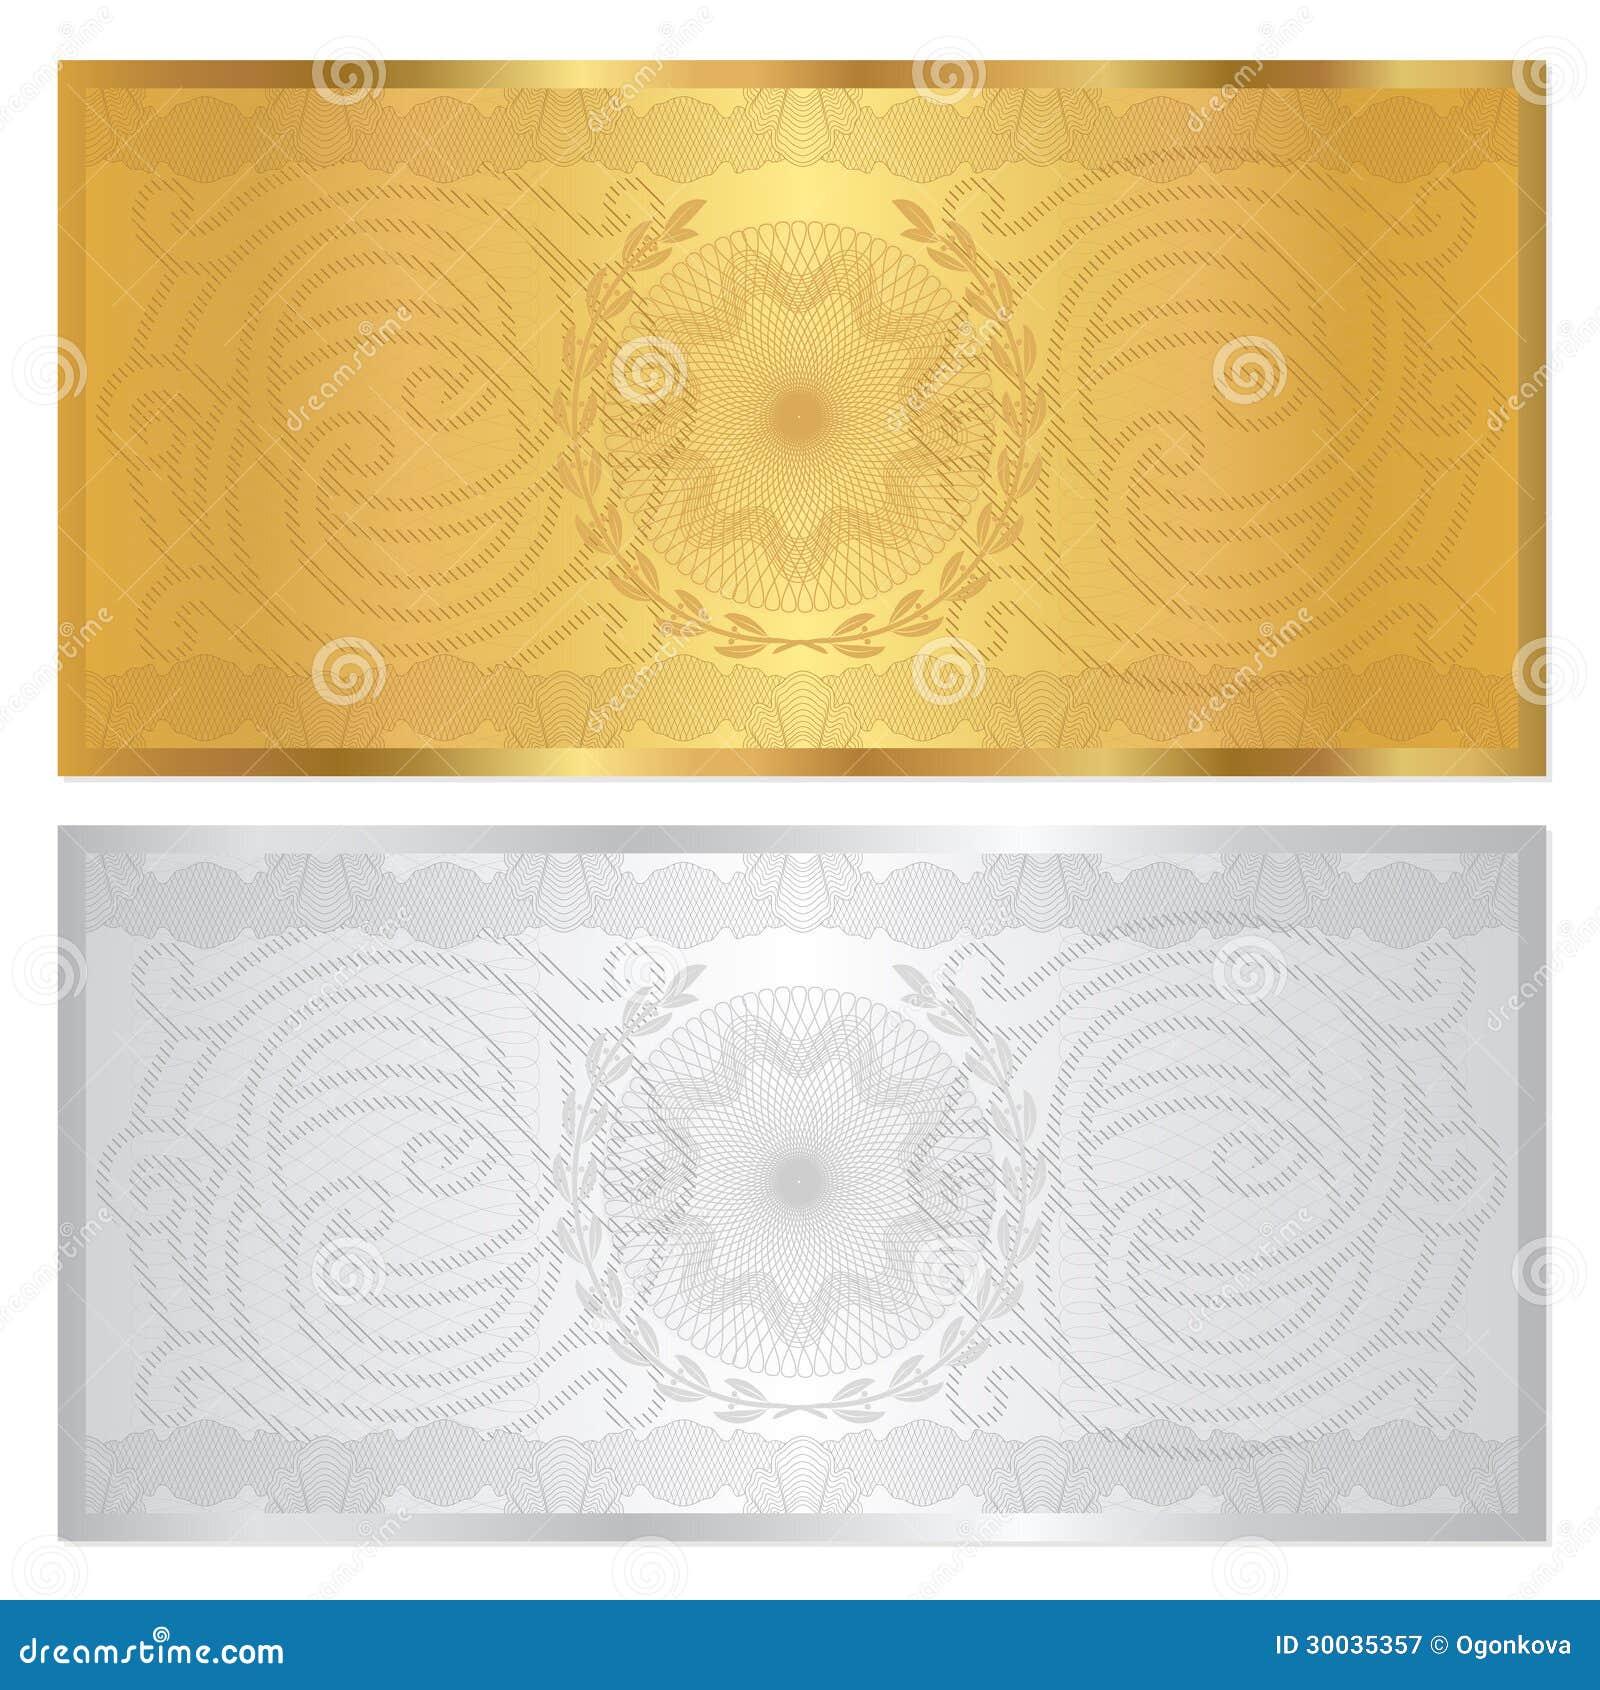 Plantilla del vale de la plata/del oro. Modelo del guilloquis